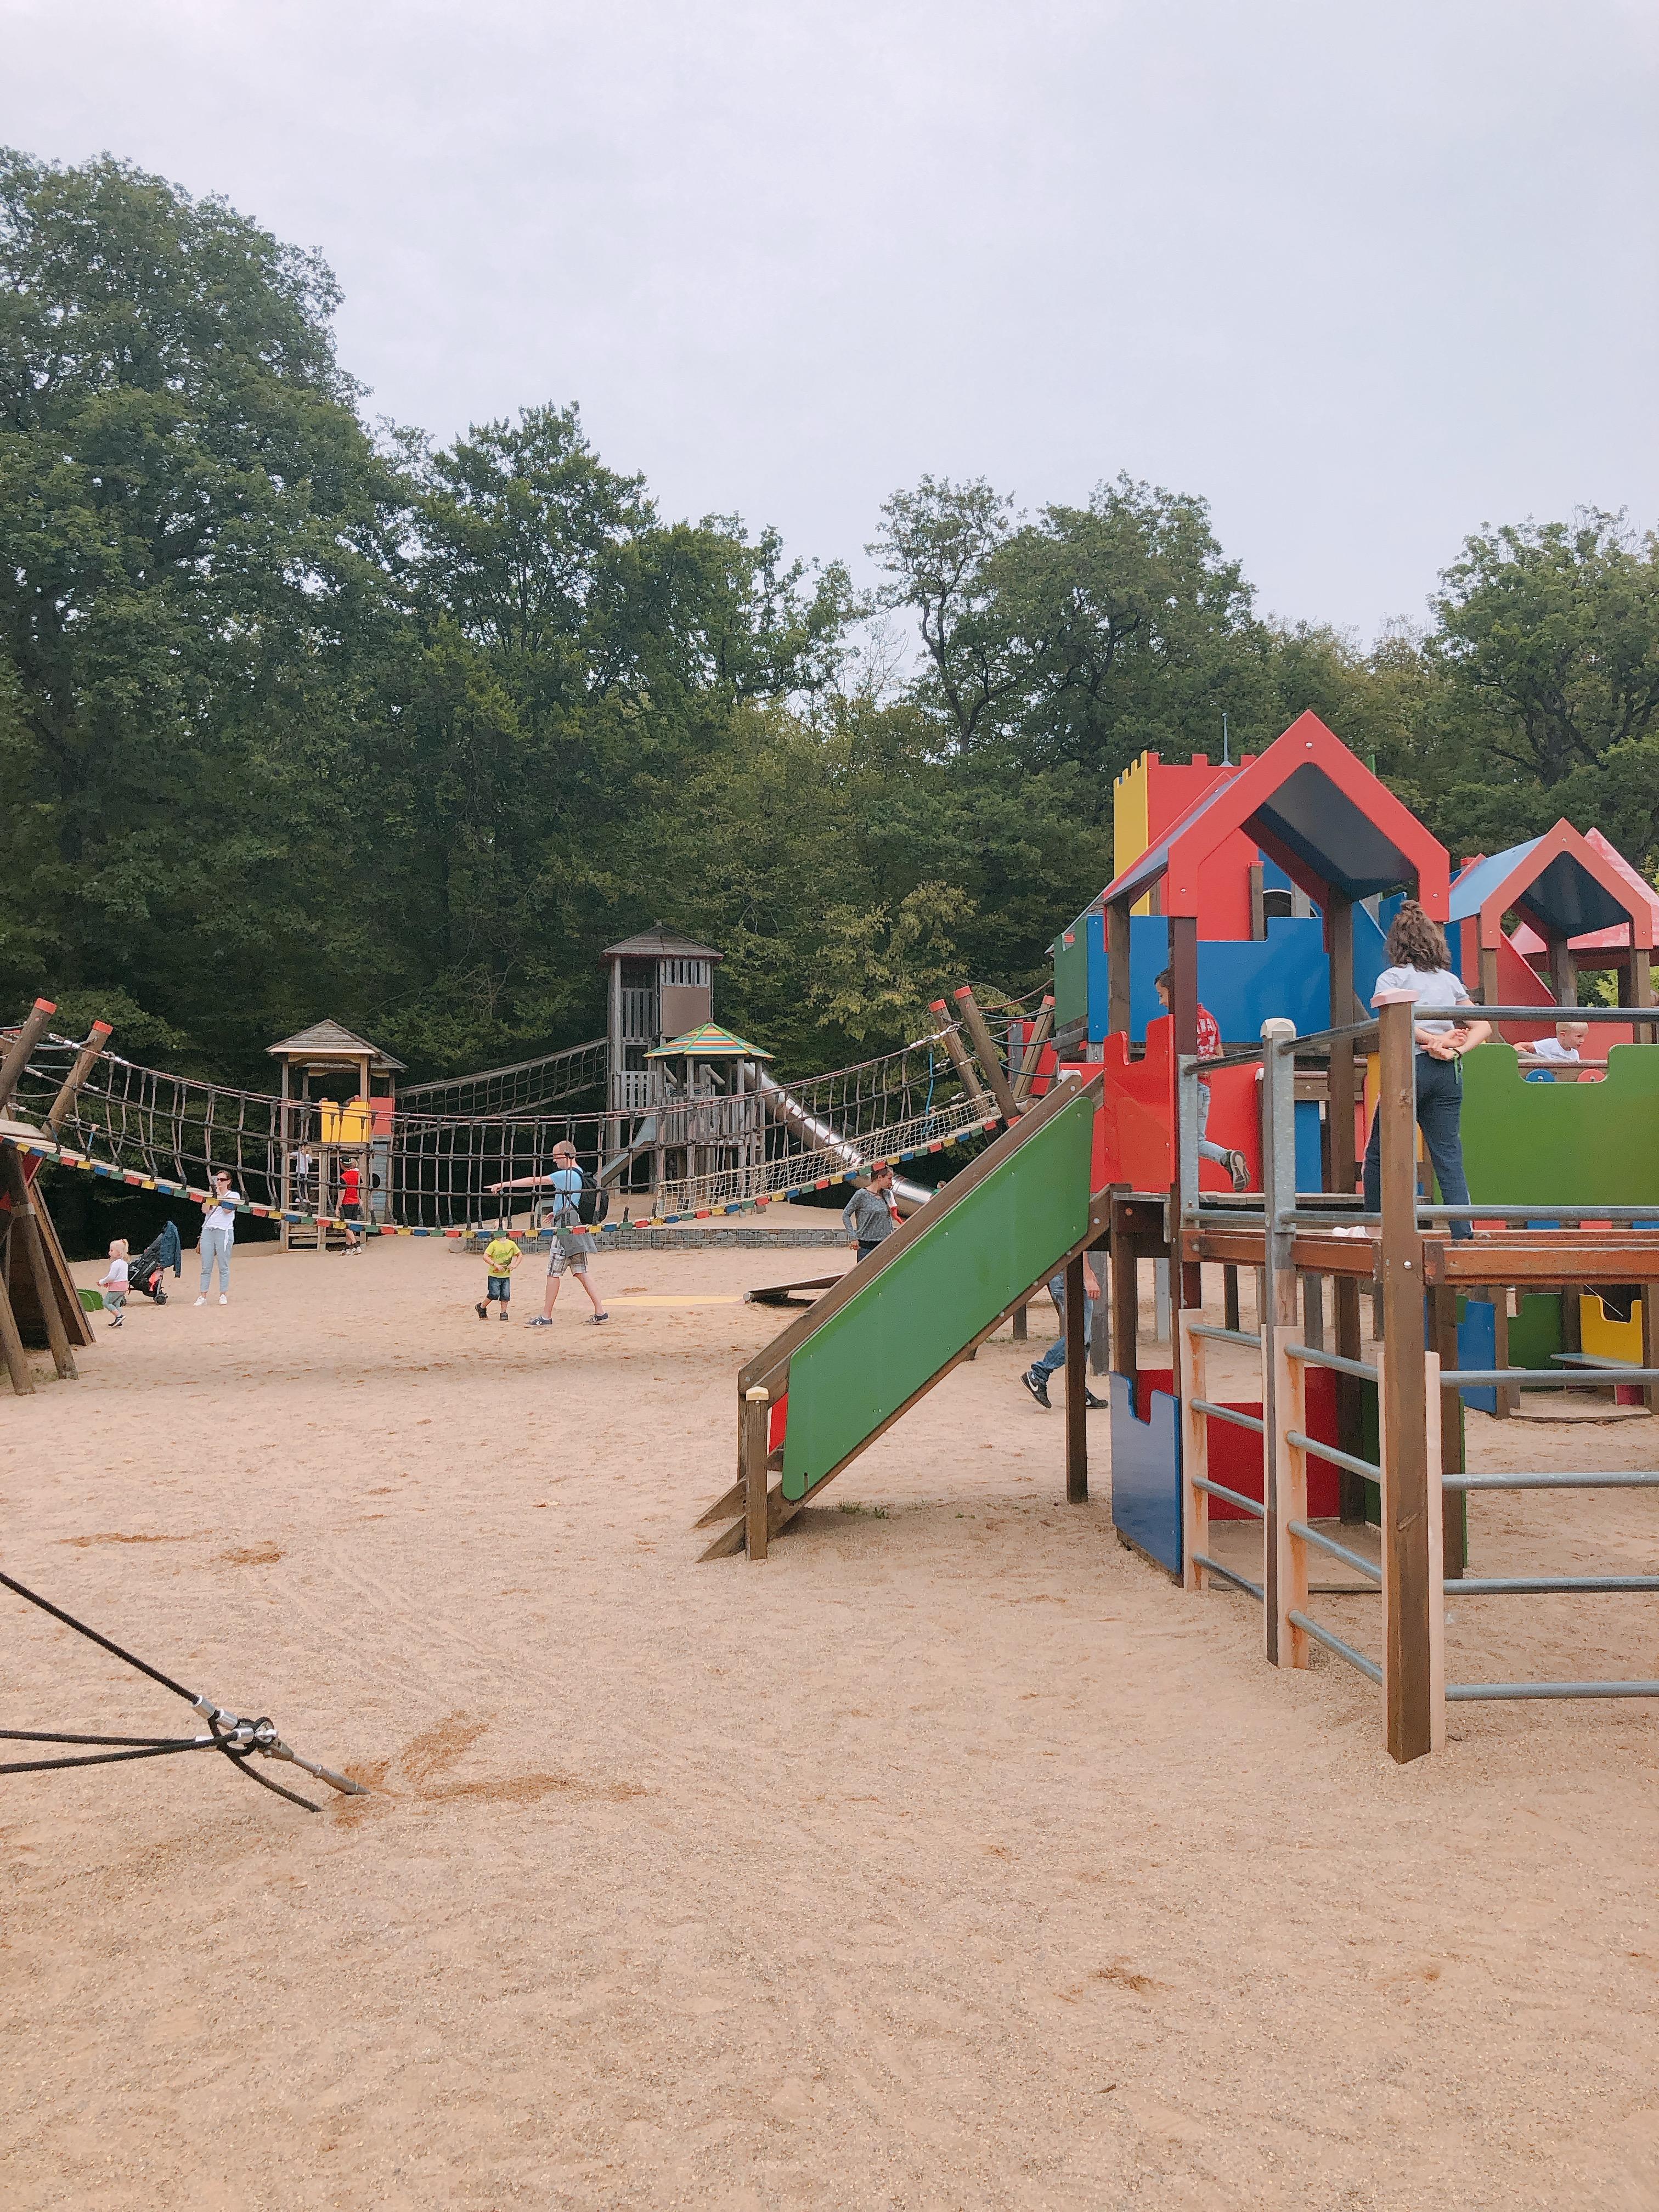 IMG 1803 - Fotodagboek Vakantie: Camping Iris Parc Birkelt in Luxemburg!